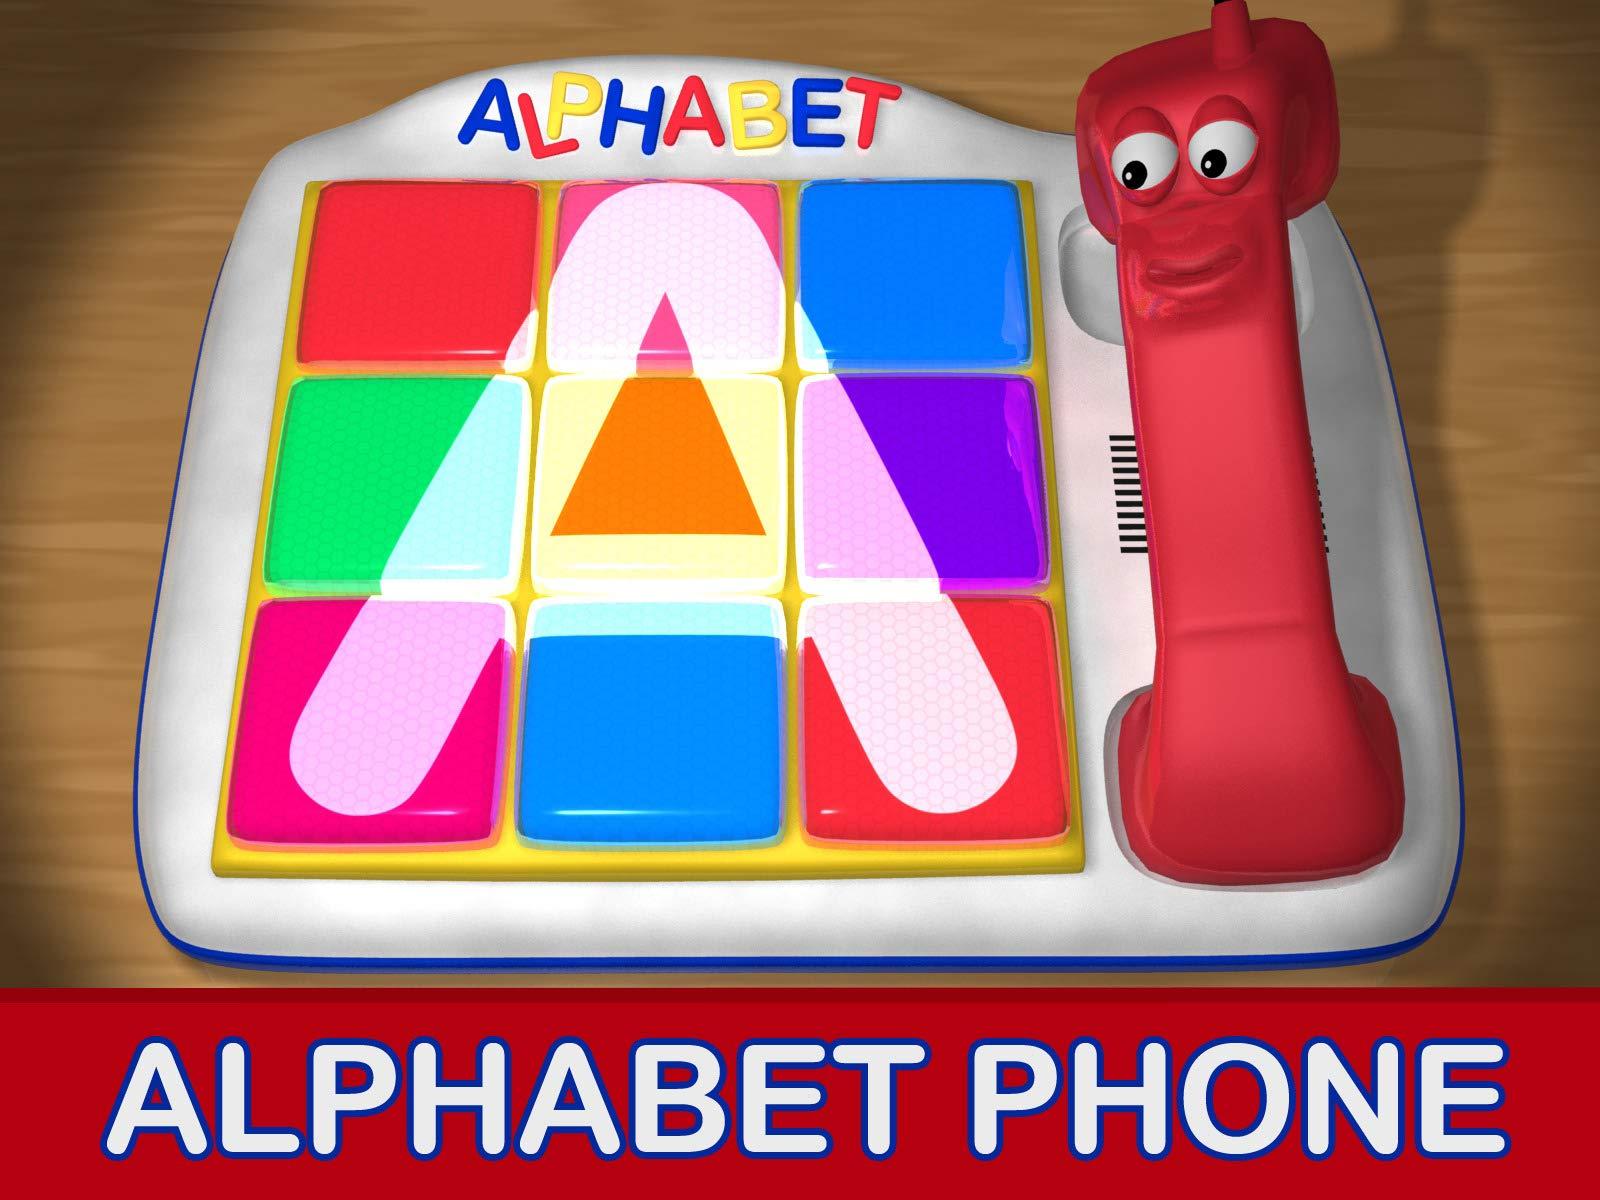 Alphabet Phone - Season 1